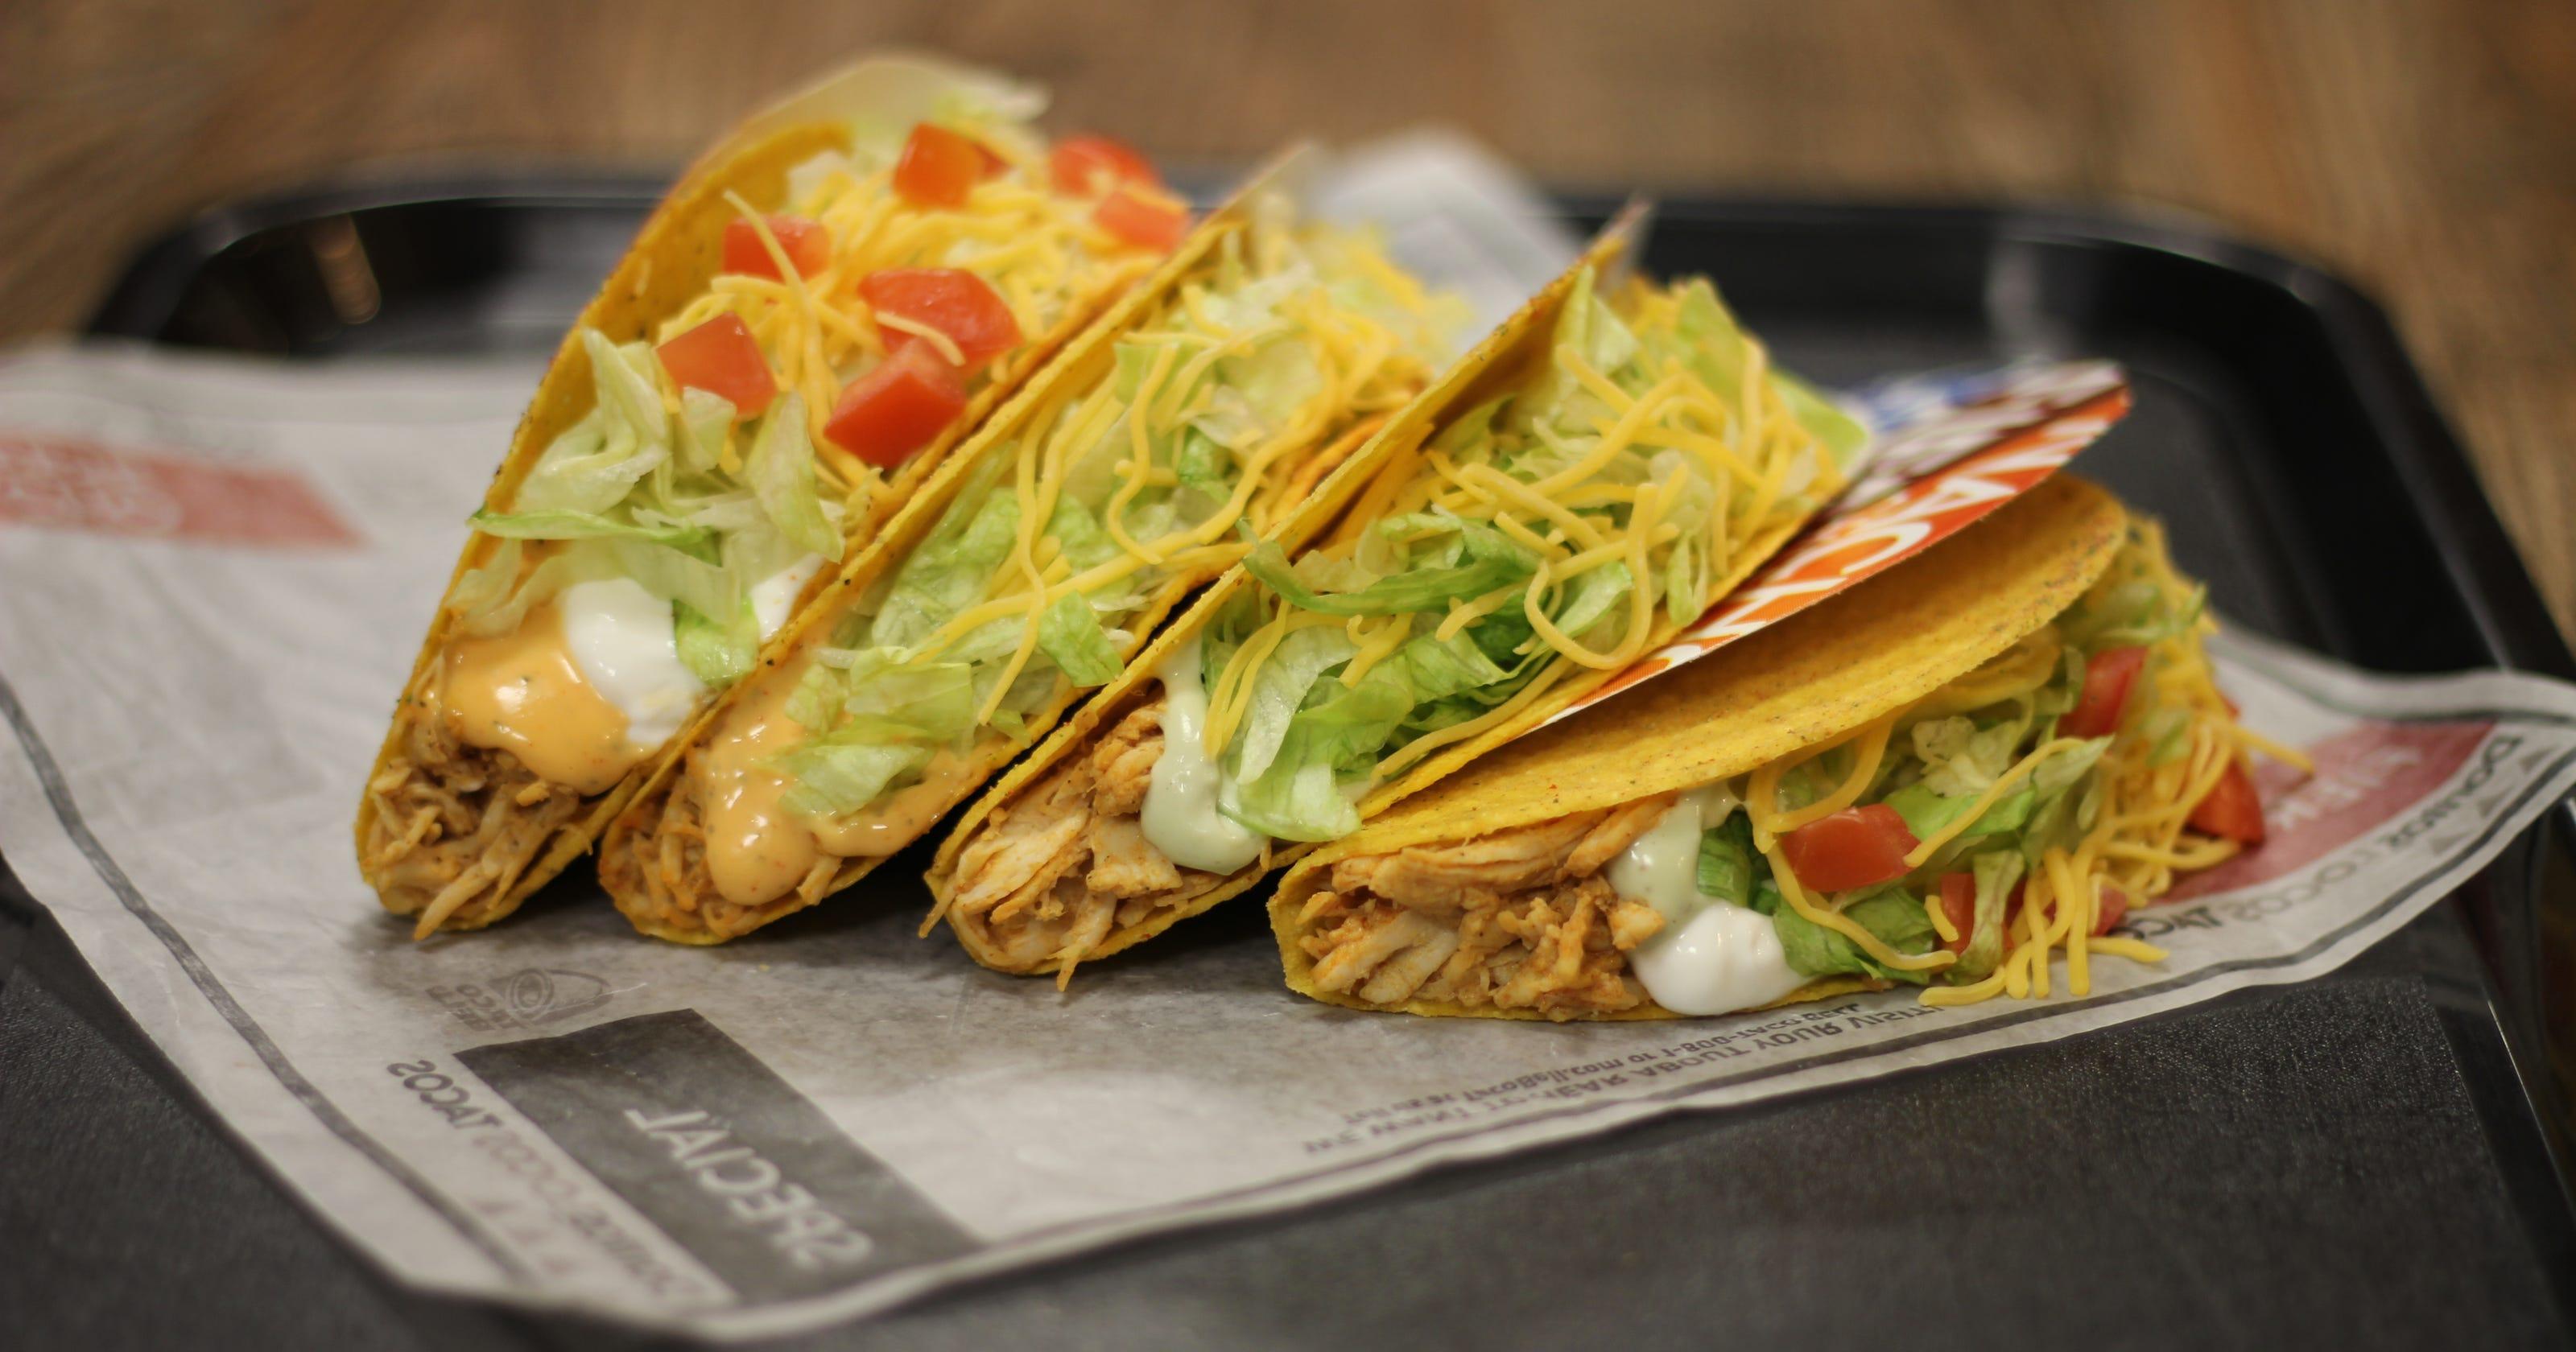 taco bell - photo #1